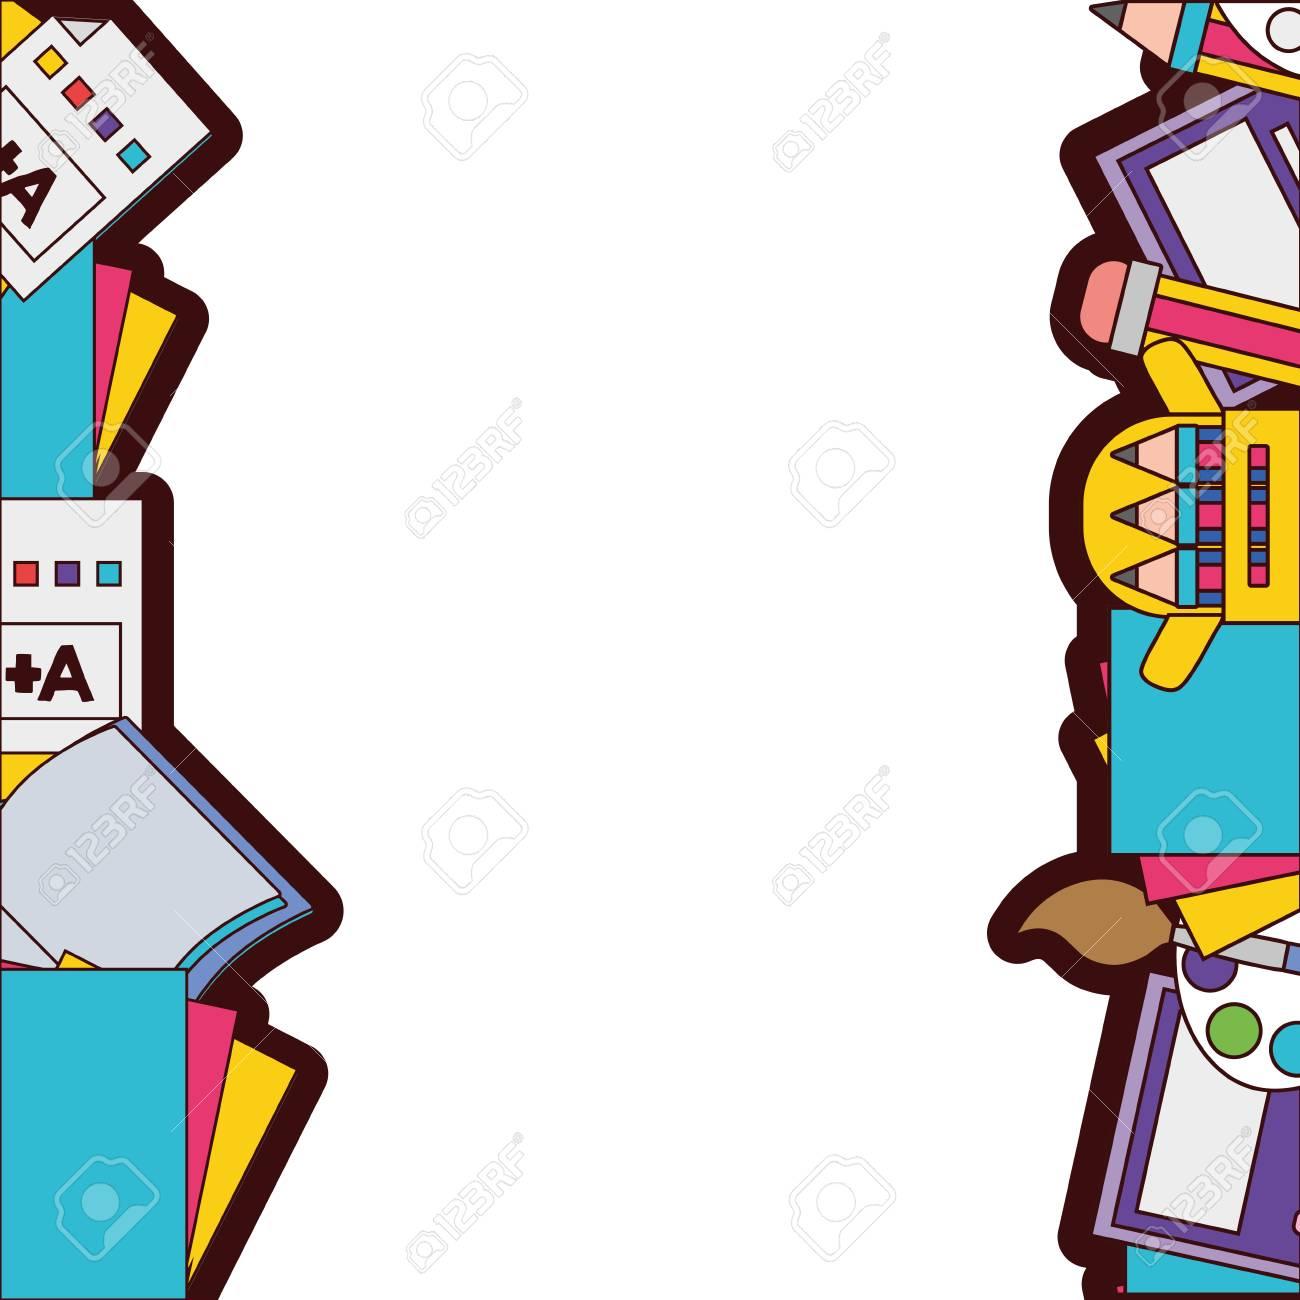 full color school tools education background design vector